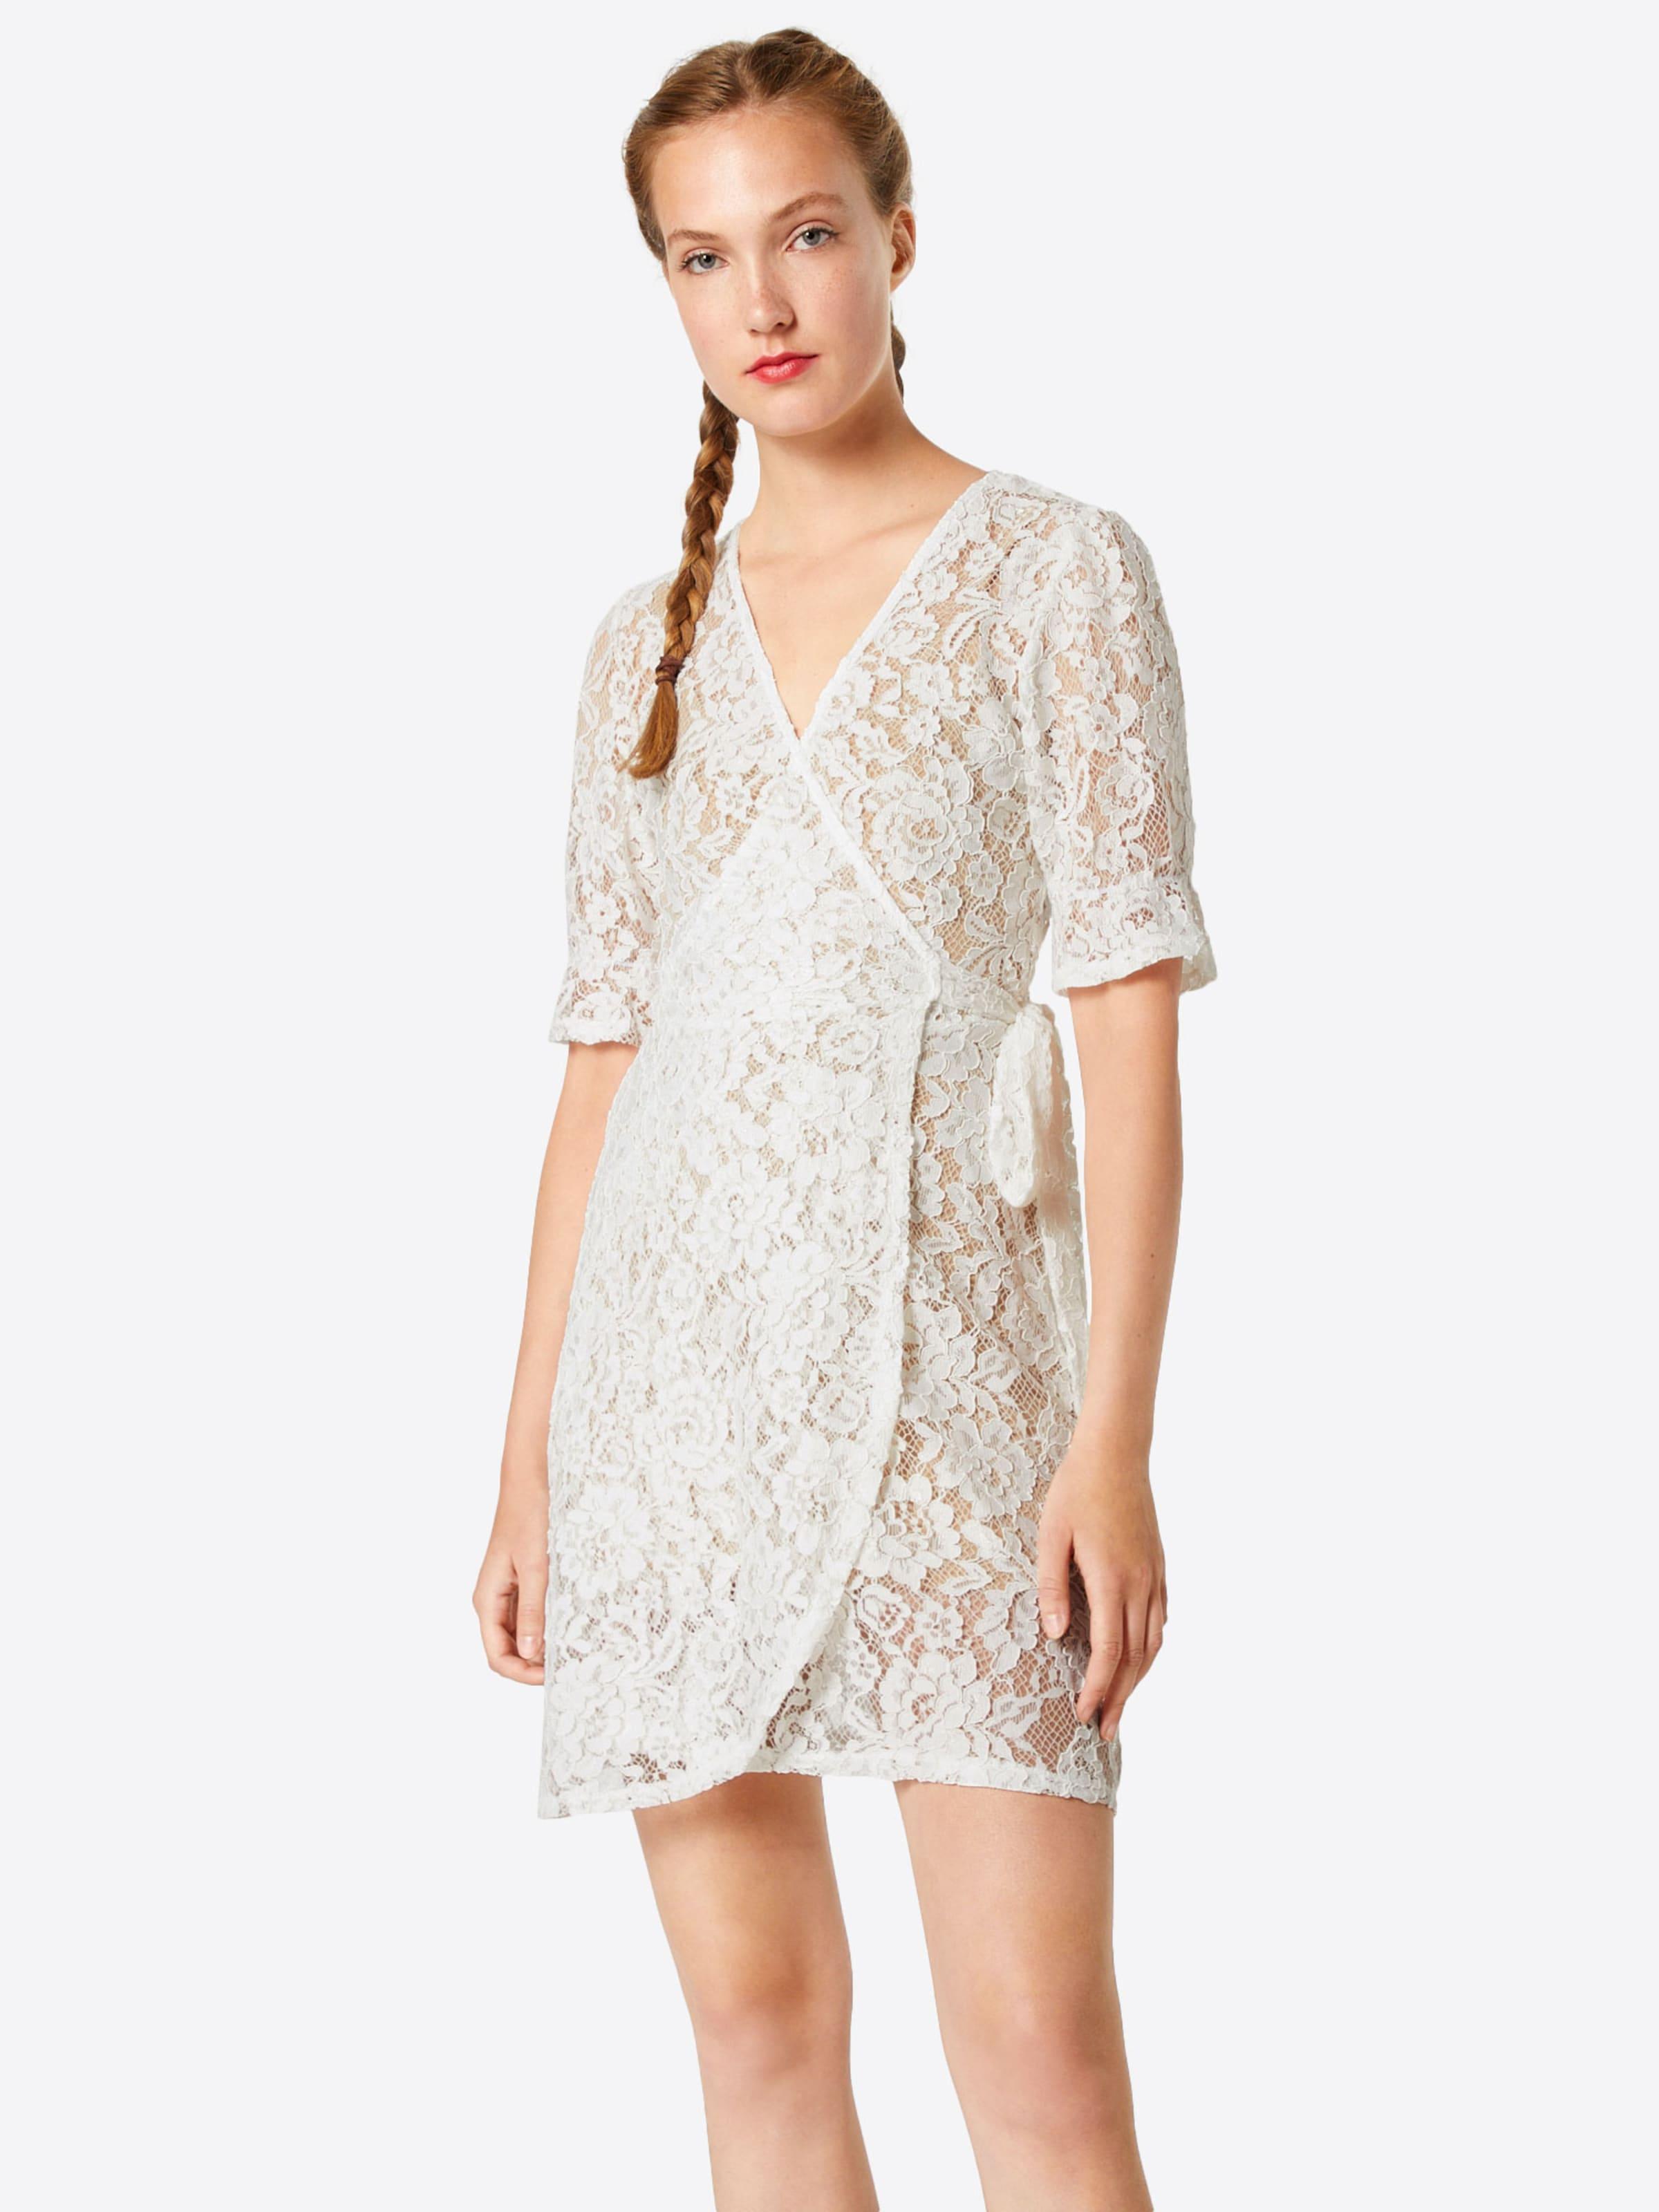 Fashion 'fingal' Union Kleid Weiß In mn0yvNO8w